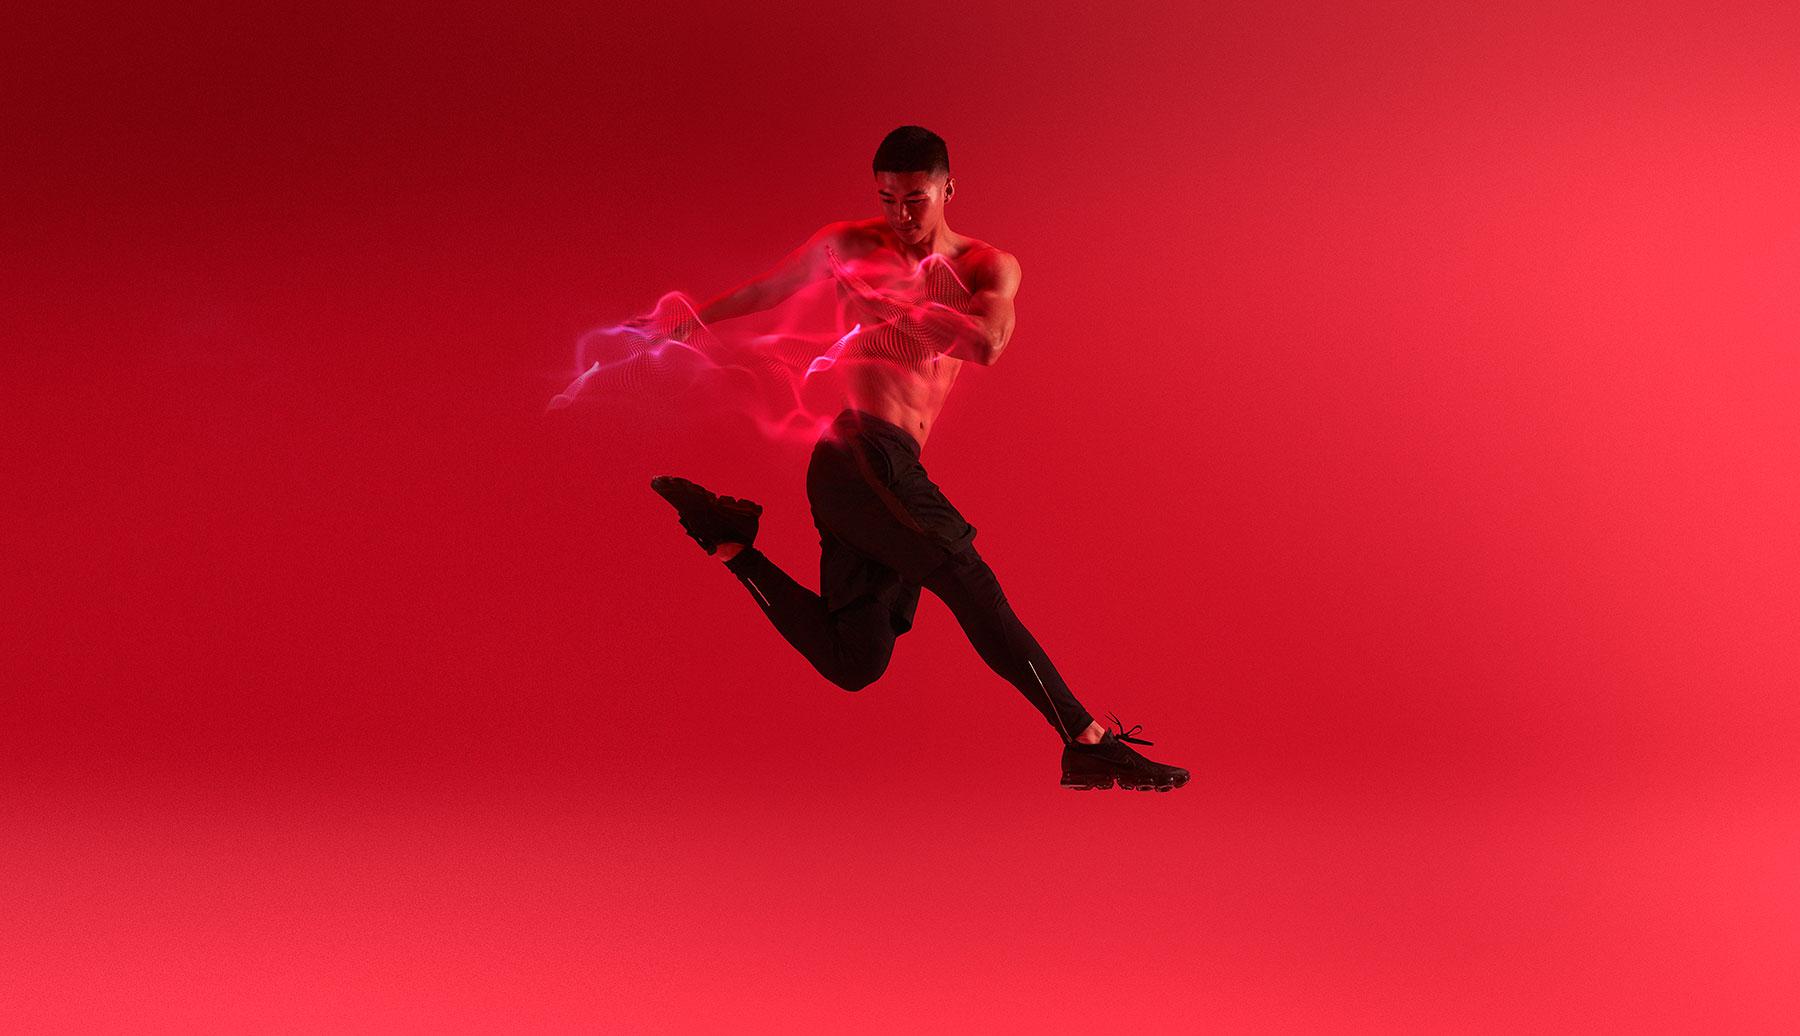 2888_jumper-sports-athletes-retouching.jpg